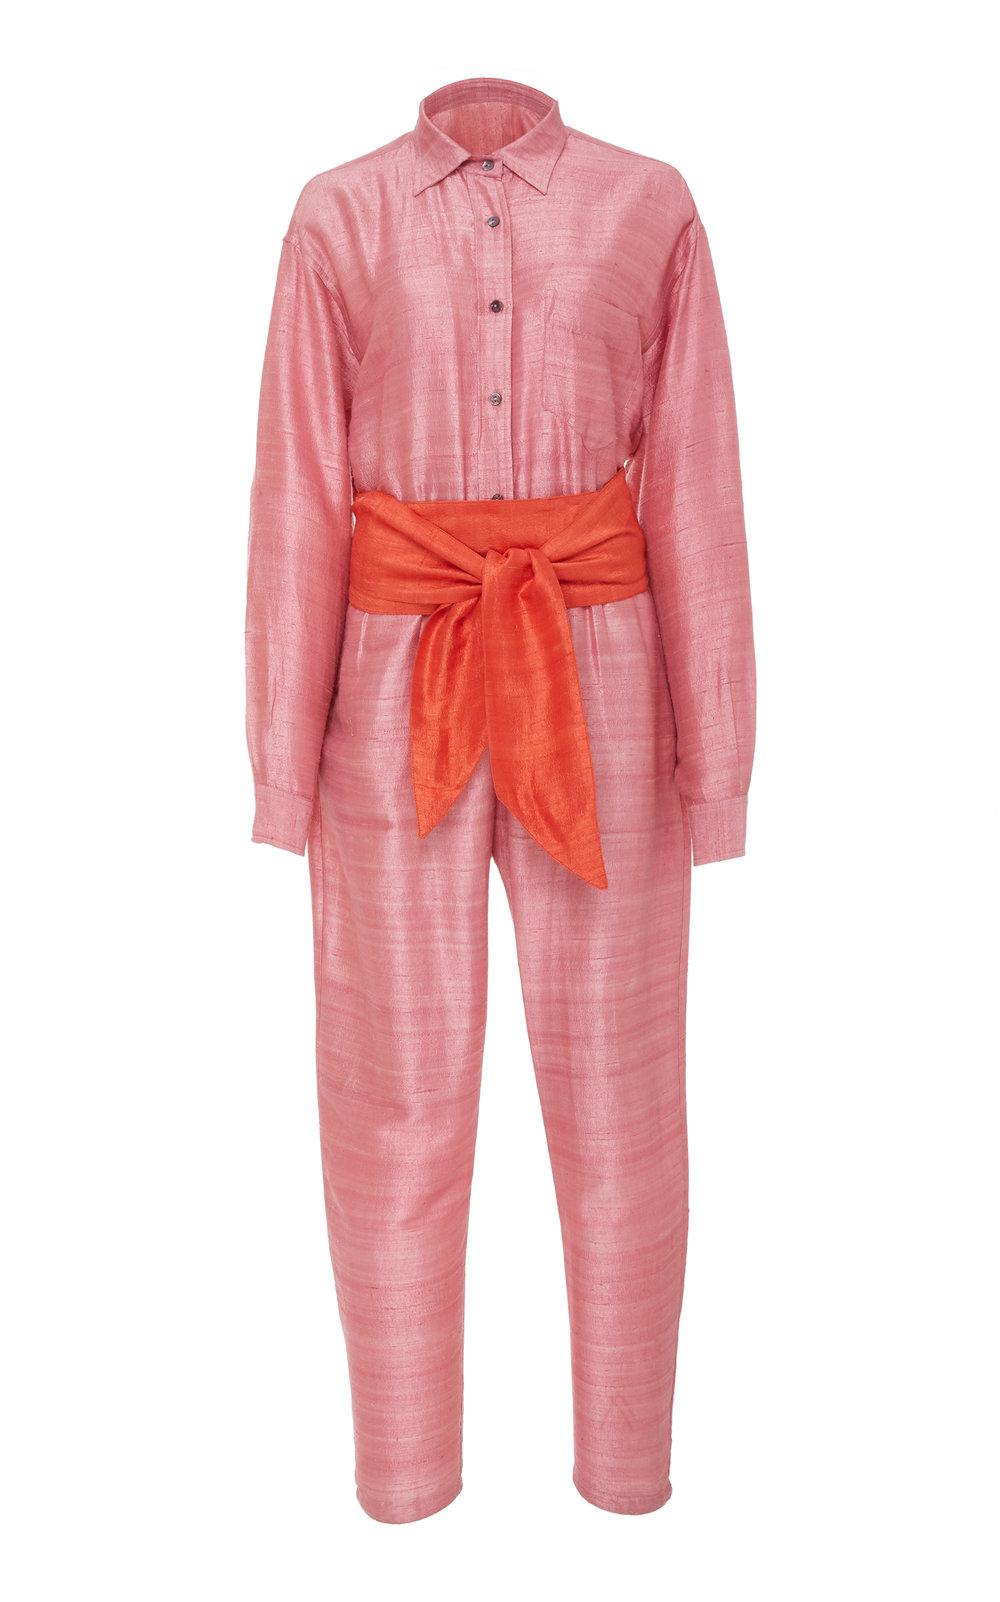 large_rhode-resort-pink-tara-jumpsuit.jpg